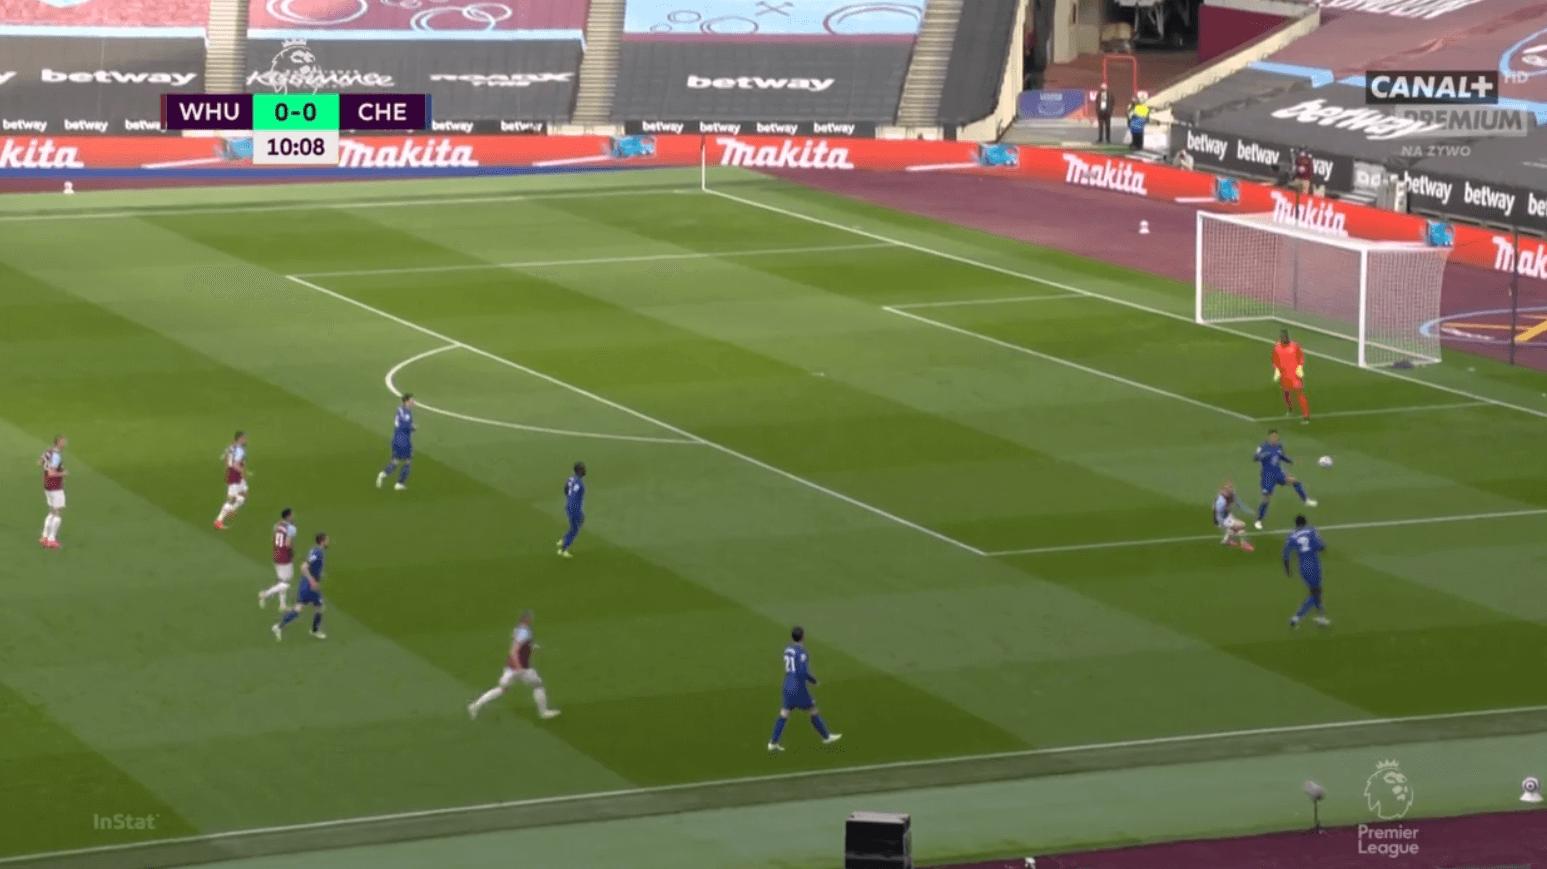 Advantage Chelsea: How Tuchel's tactical tweaks helped the Blues best West Ham - tactical analysis tactics